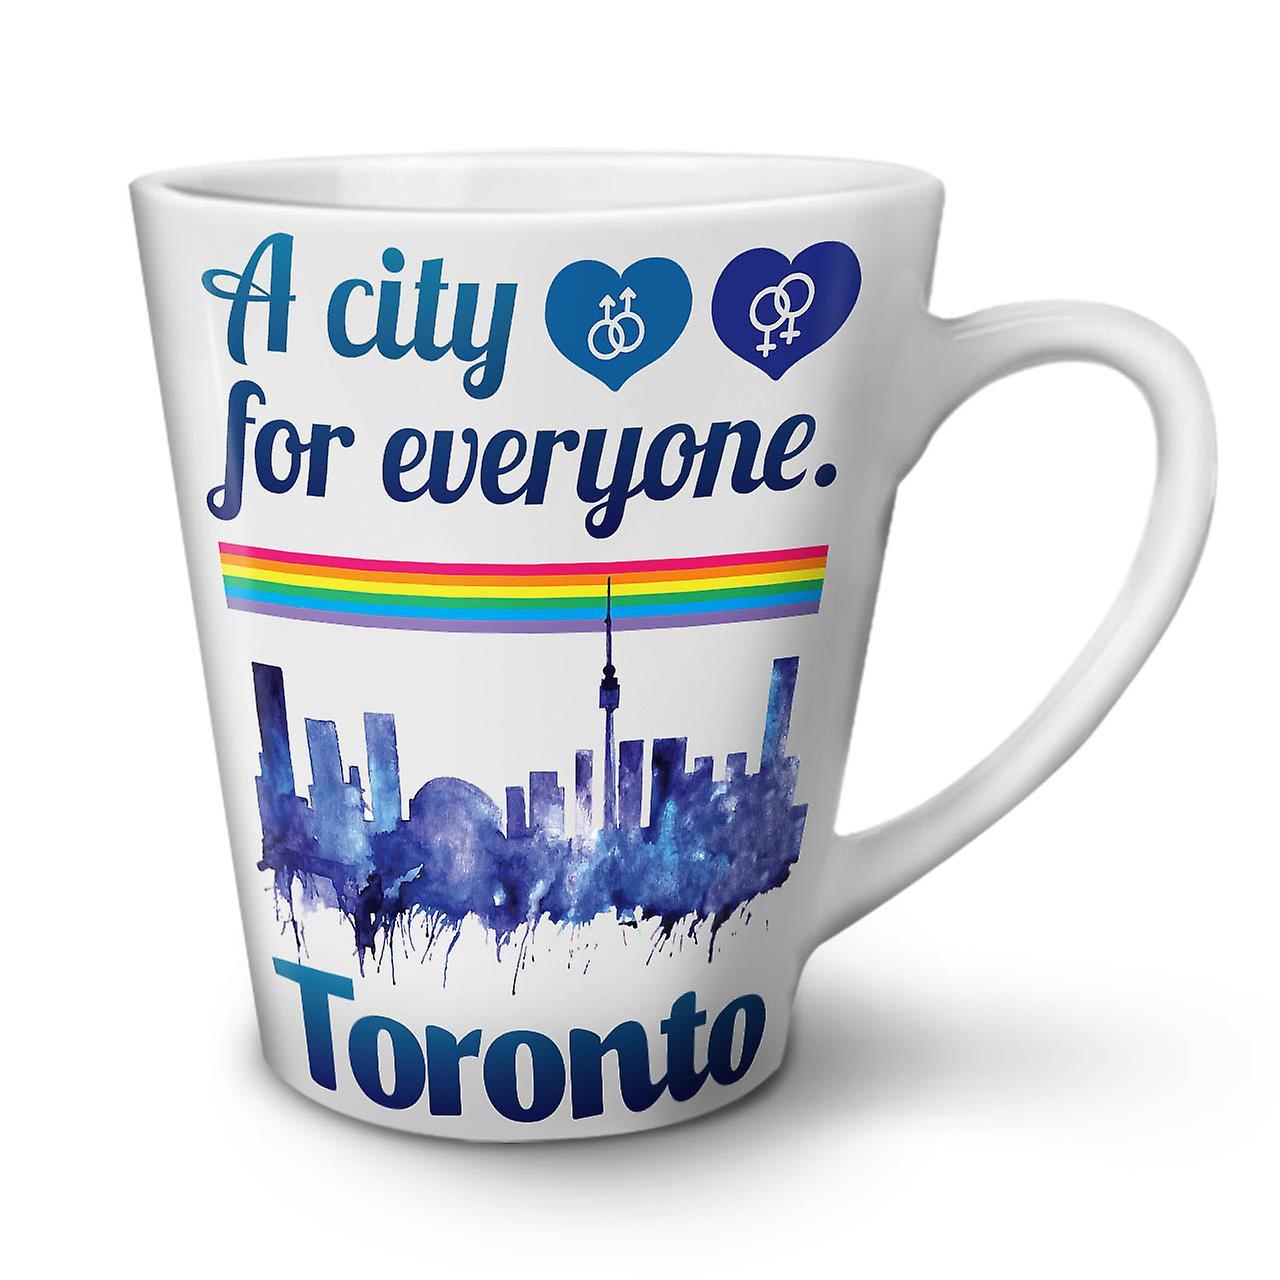 Pride Thé Blanc Latte Toronto Mug 12 OzWellcoda En Café Céramique Amour Nouveau lwkuiTOXPZ